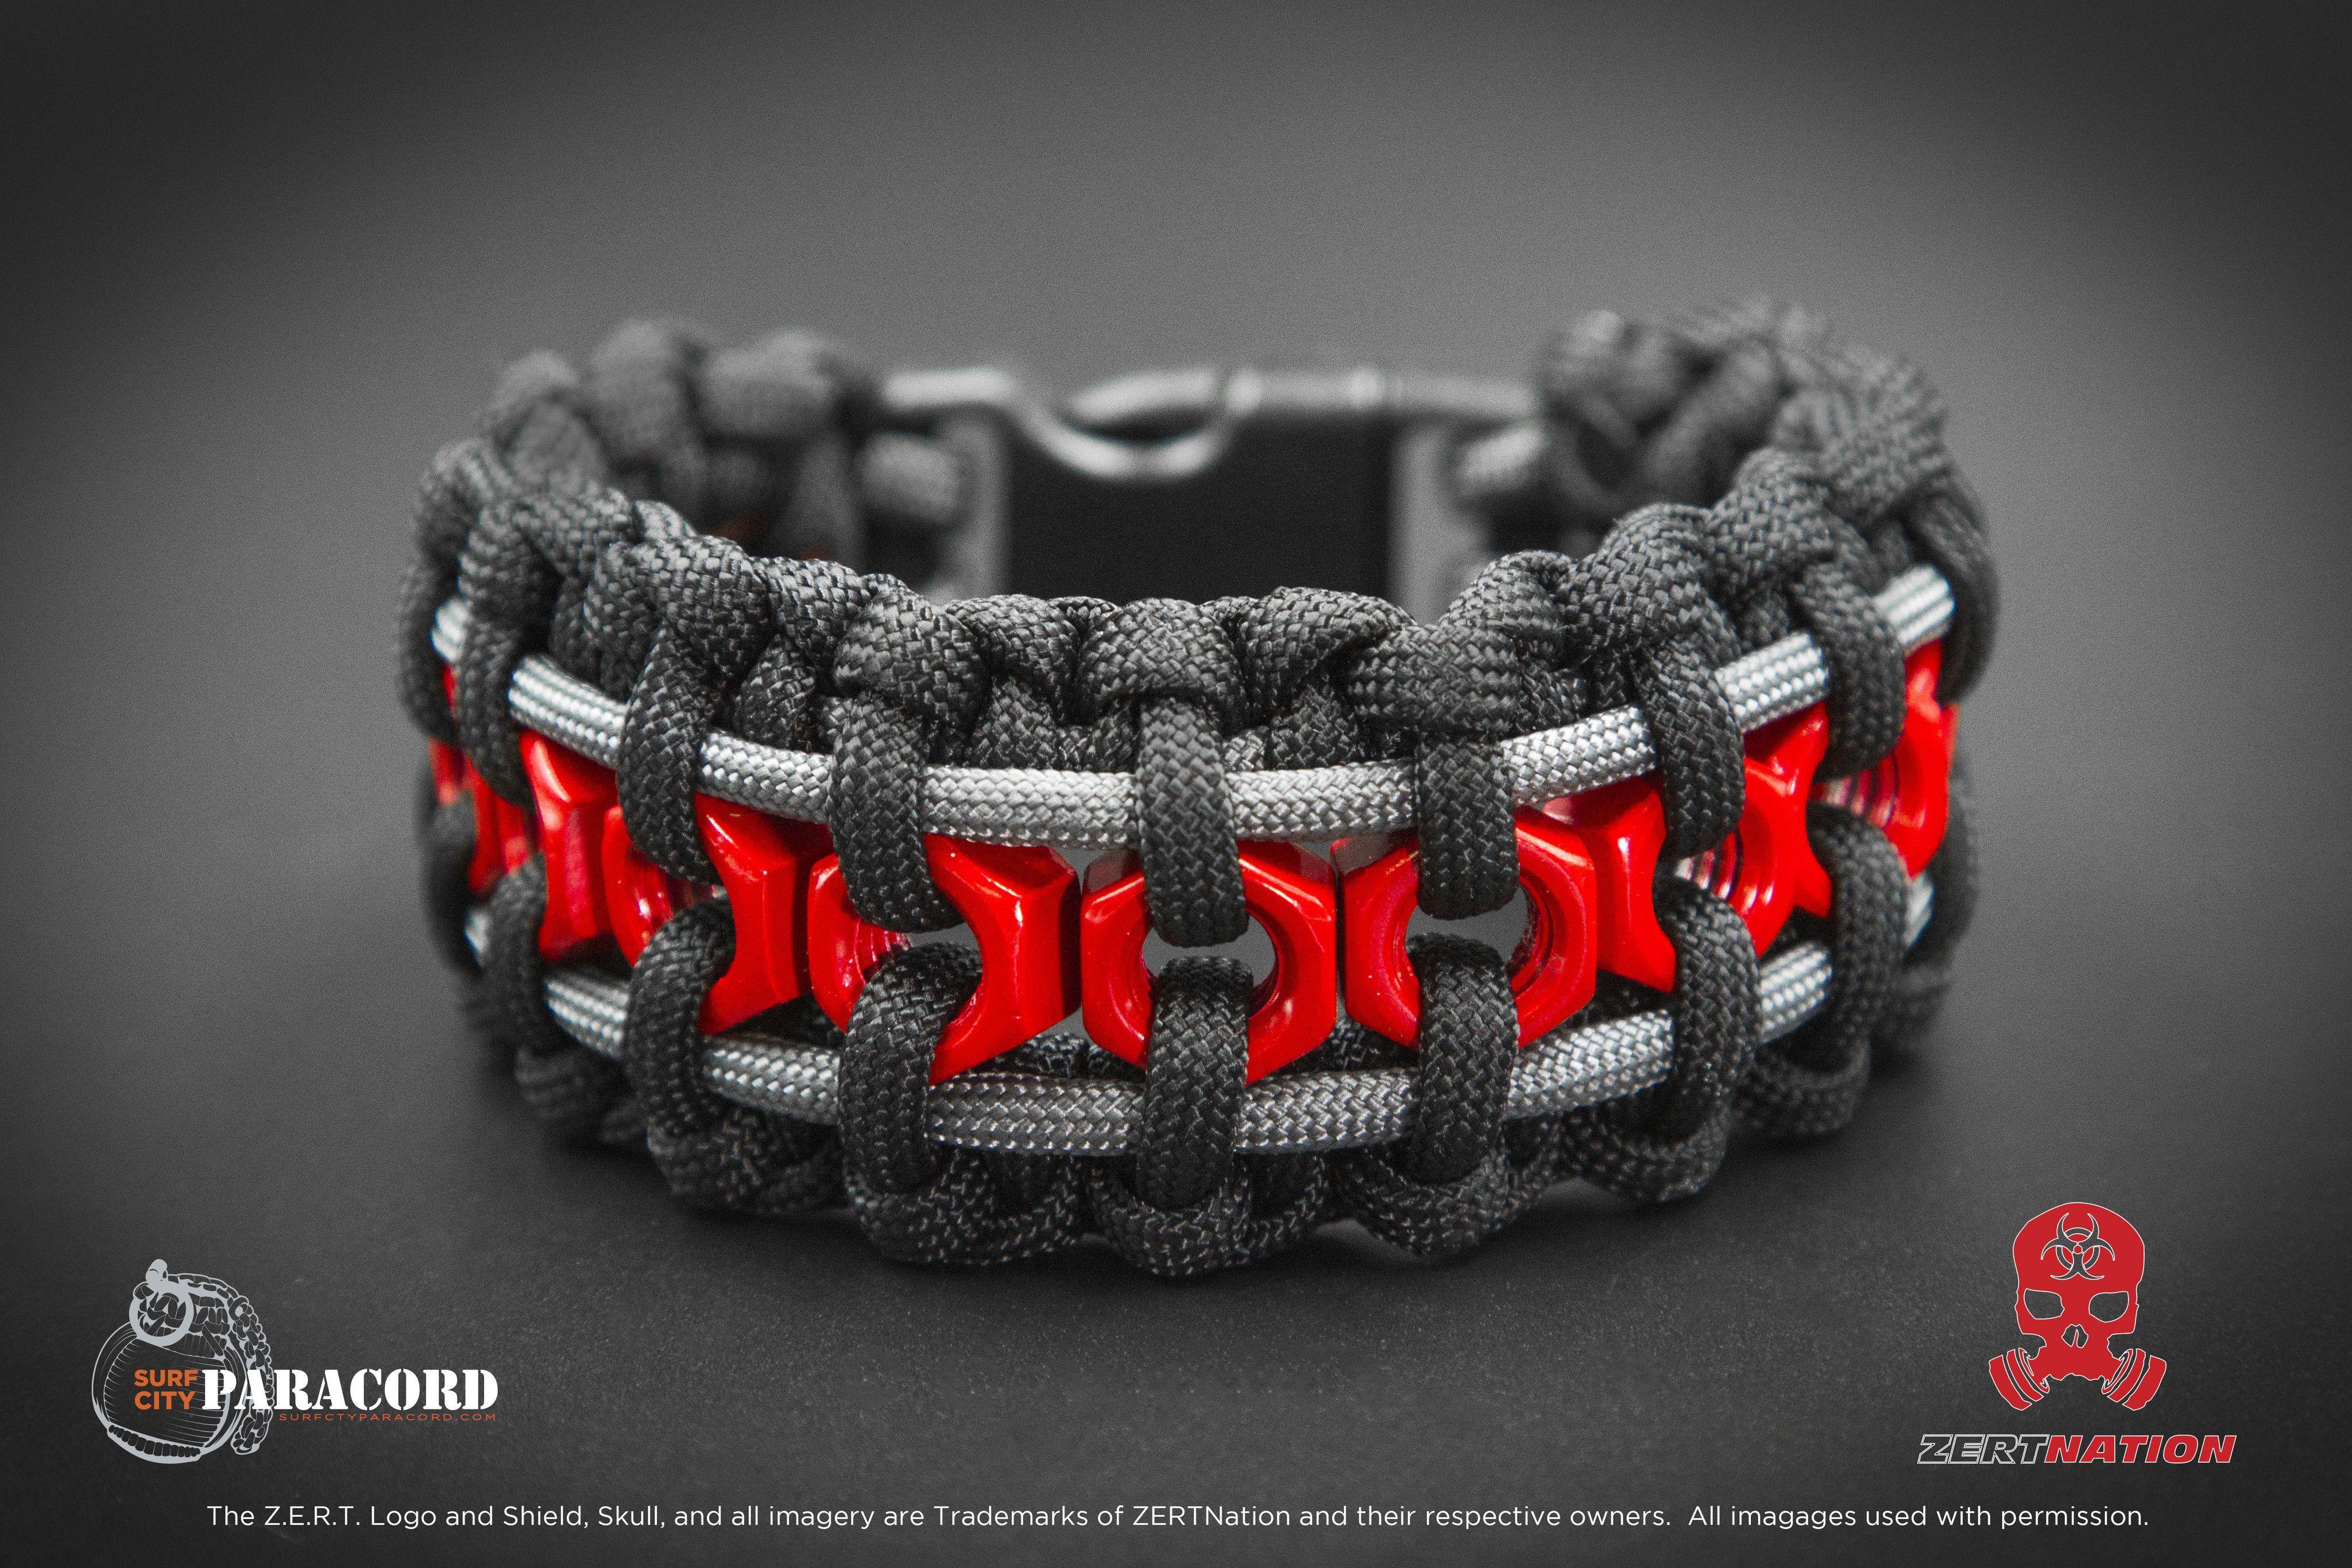 Z E R T Hex Nut Paracord Bracelet Black Red And Grey